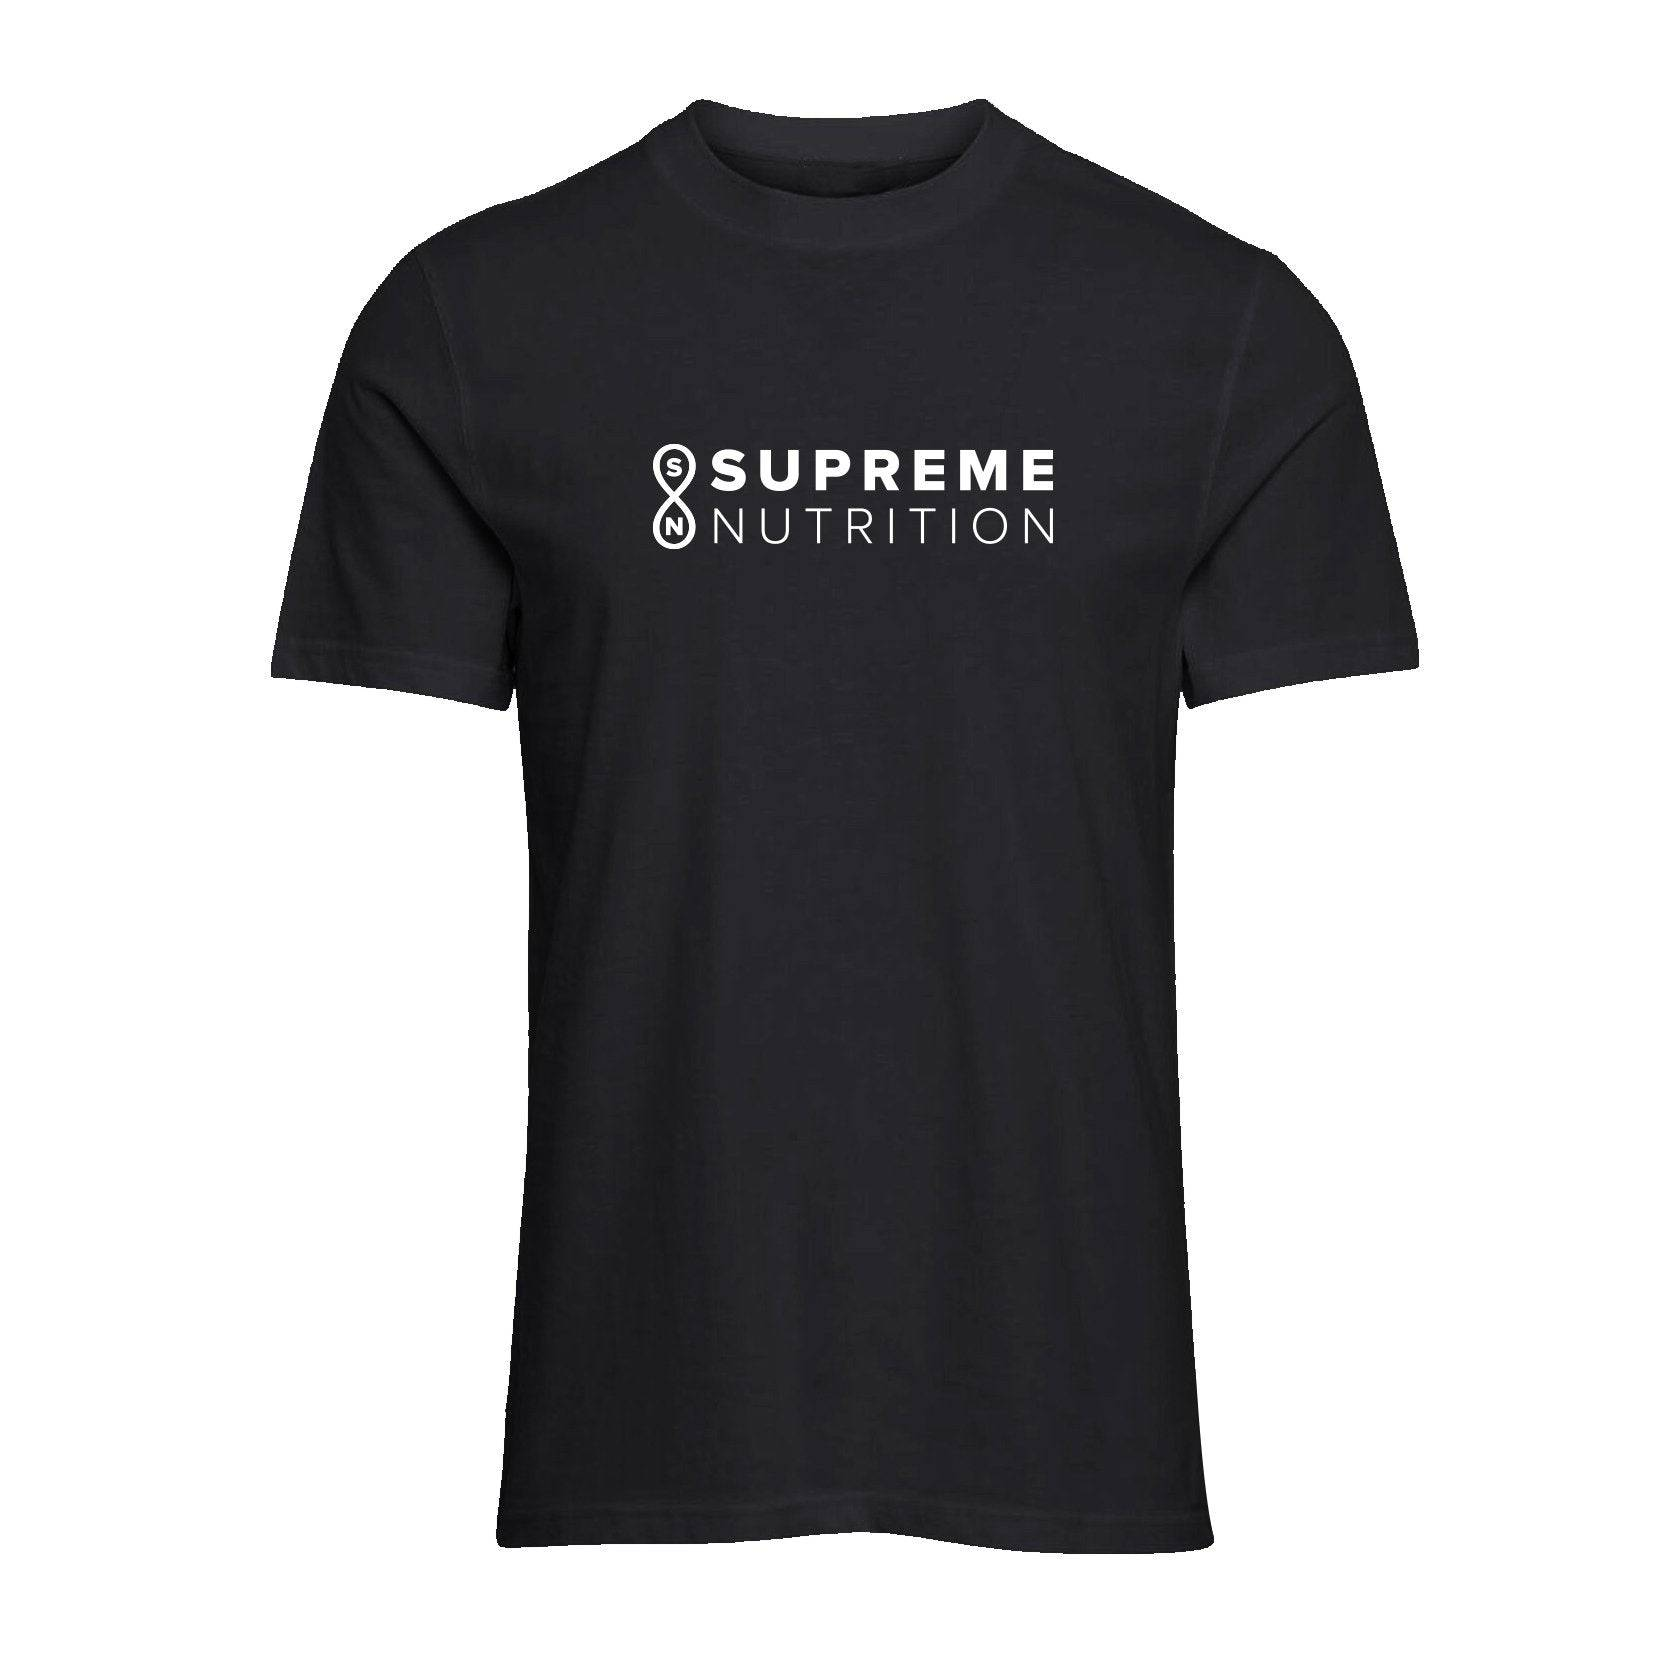 Supreme Nutrition Supreme T-Shirt - Black